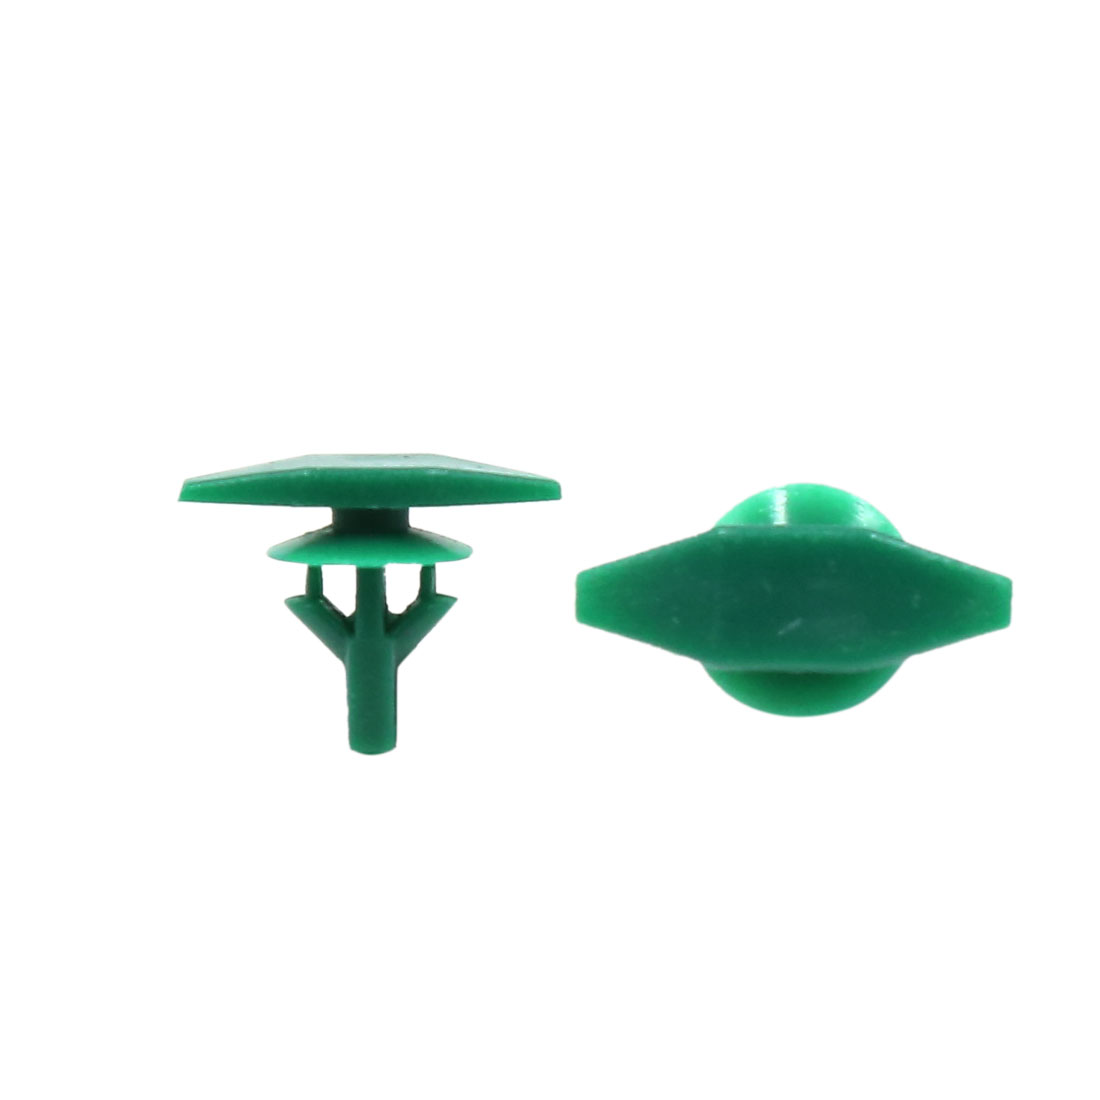 20Pcs Green 6mm Hole Dia Screw Fastener Rivet Bumper Hood Fender Clips for Car